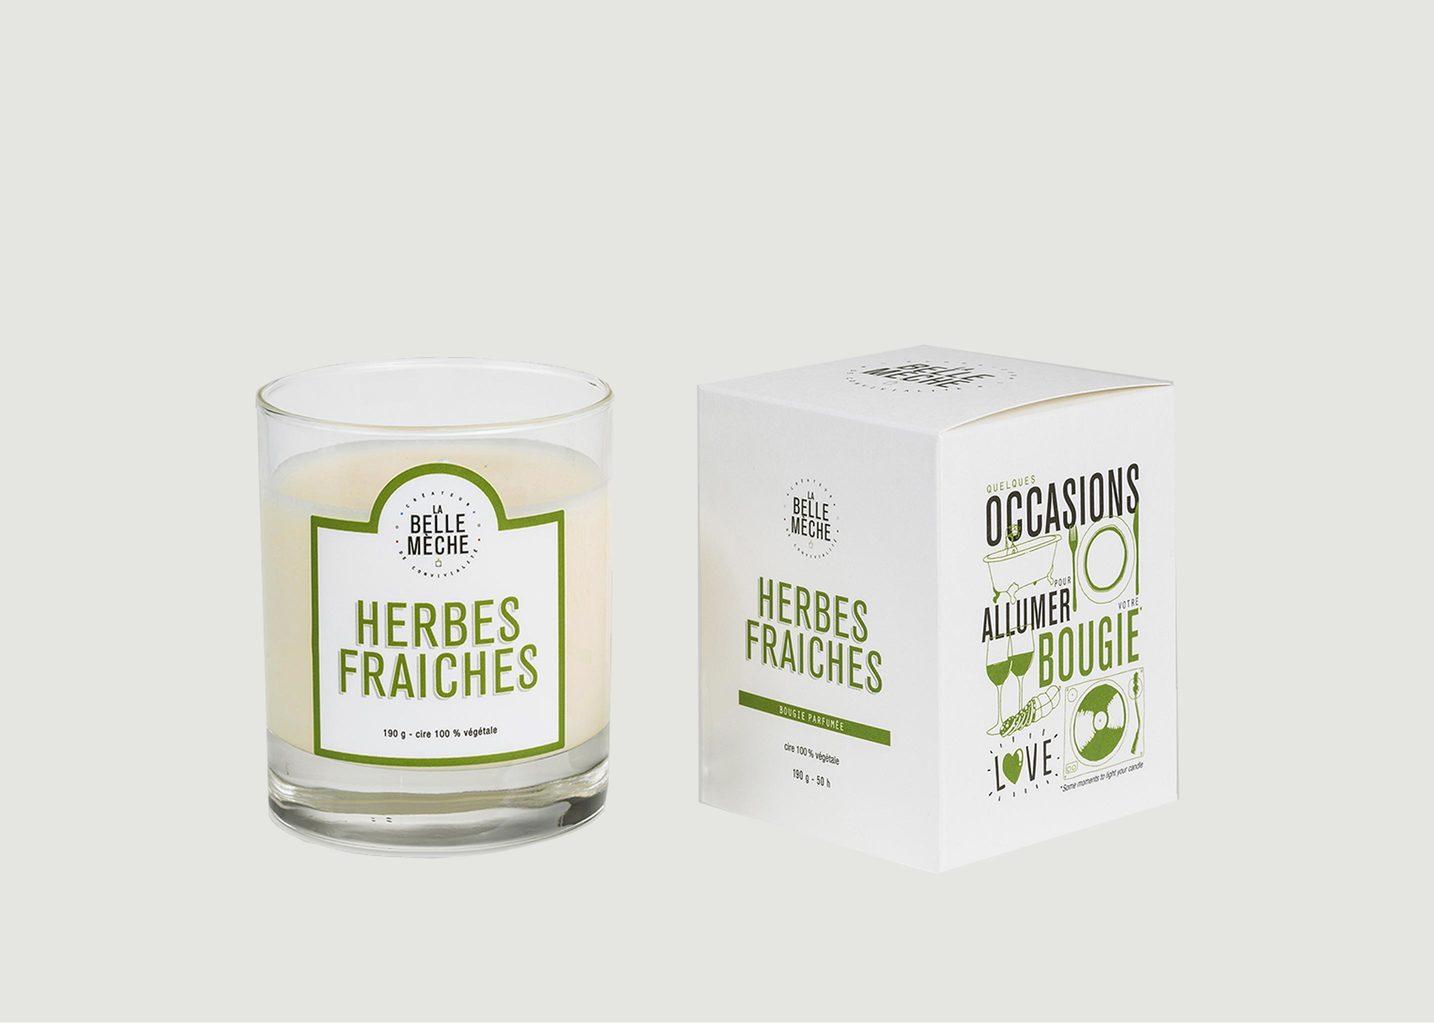 Bougie Herbes Fraiches - La Belle Mèche